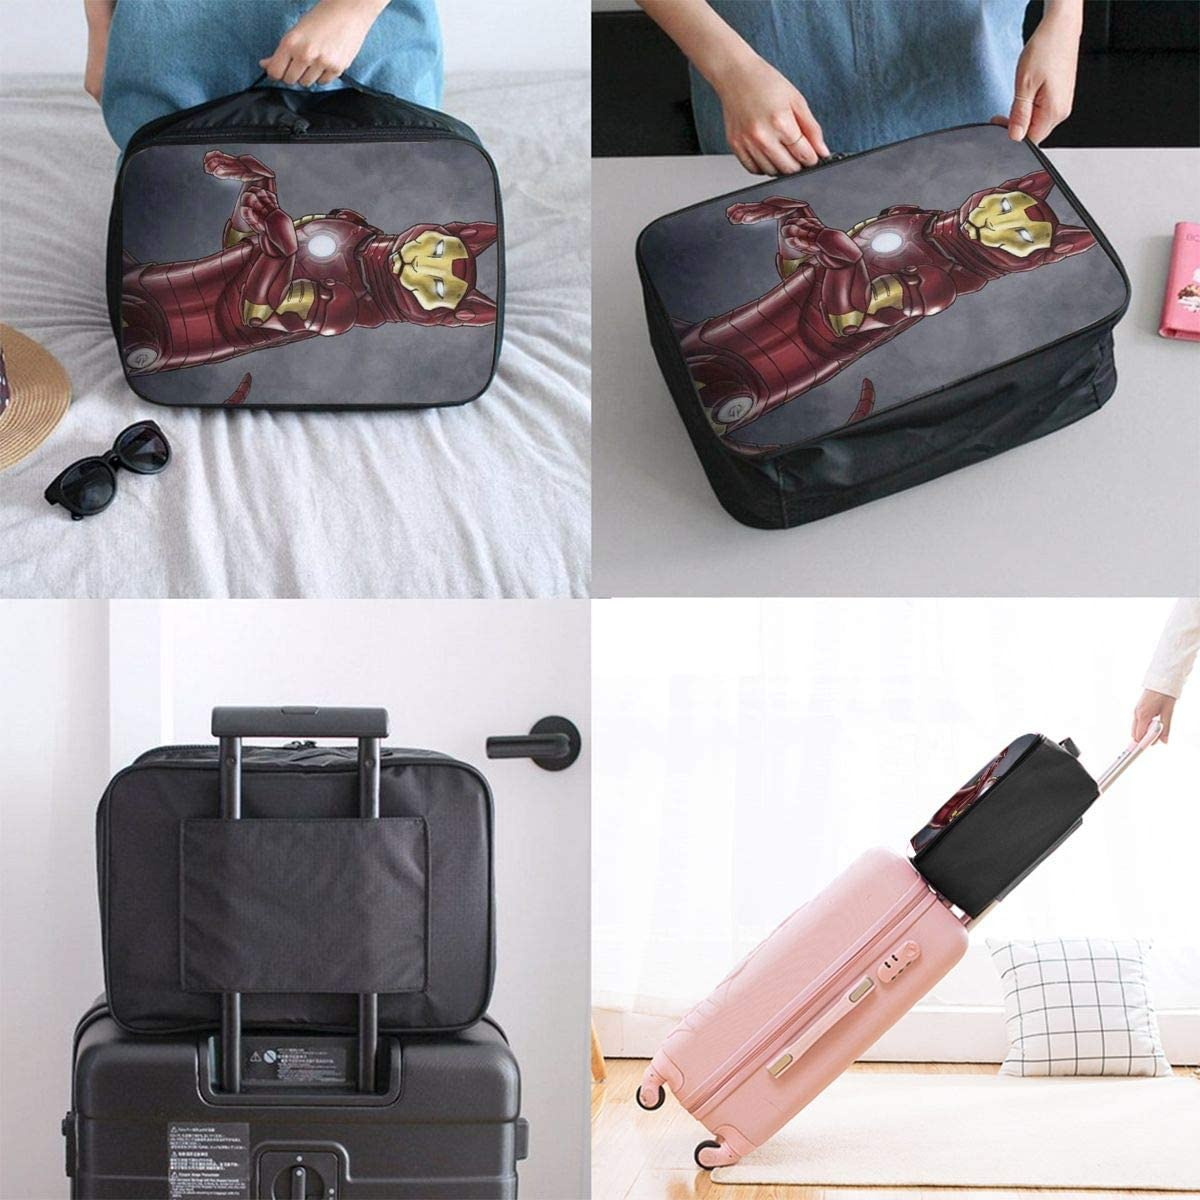 Christmas Gingerbread Man Travel Carry-on Luggage Weekender Bag Overnight Tote Flight Duffel In Trolley Handle